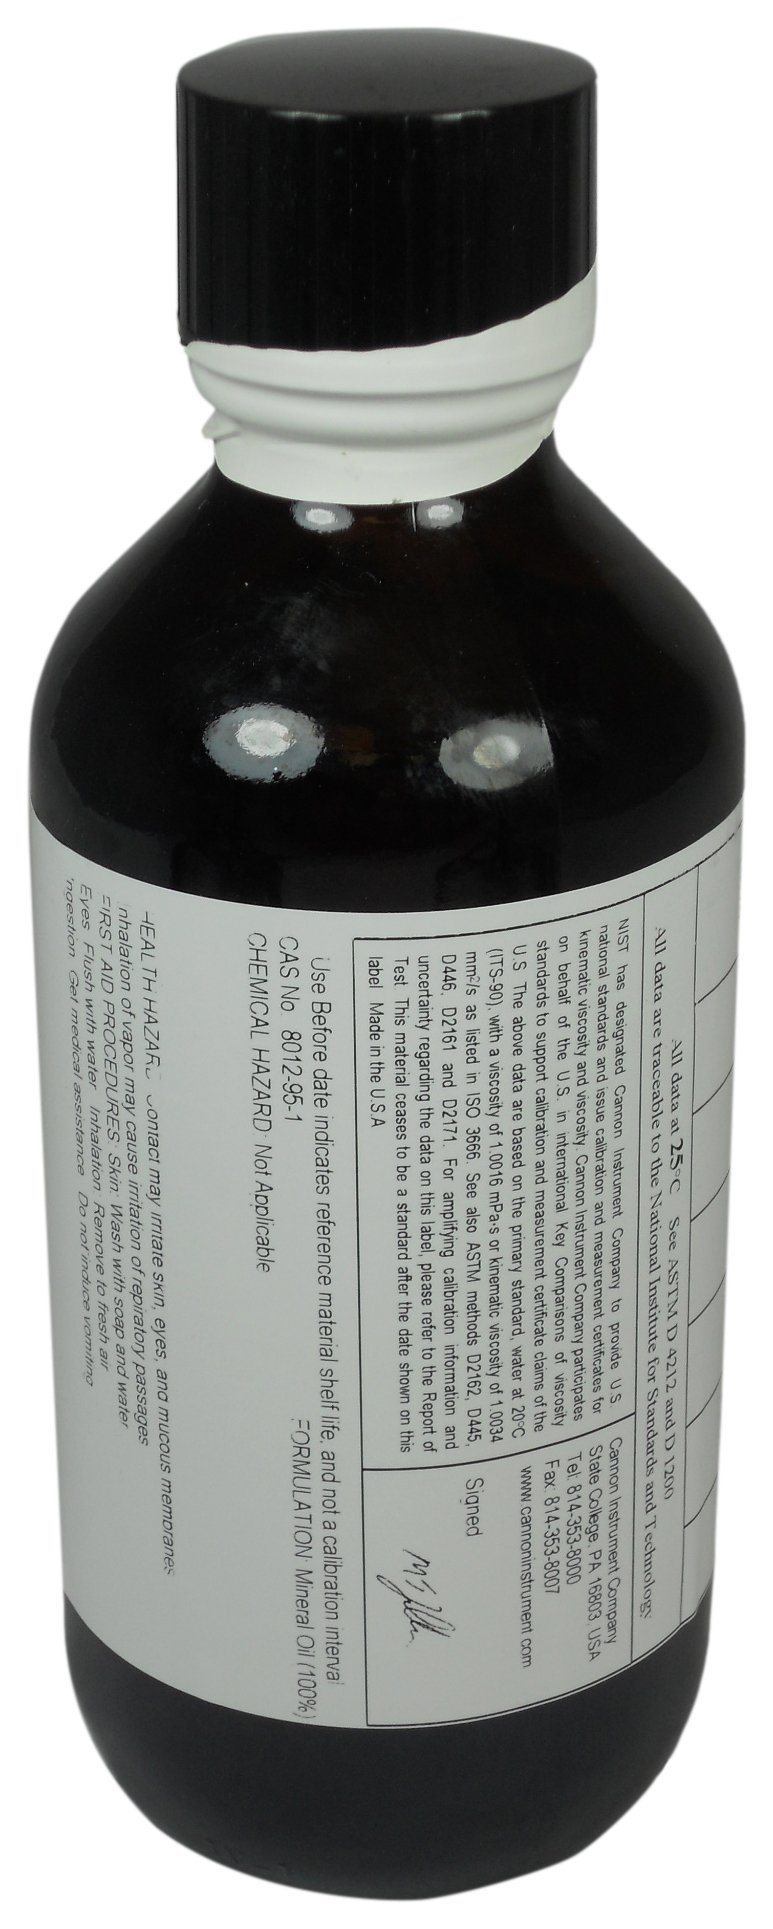 BYK-Gardner 4044 Certified Viscosity Standard Oils for Rotational Viscometers, Brookfield-Type, RT1000 by BYK-Gardner